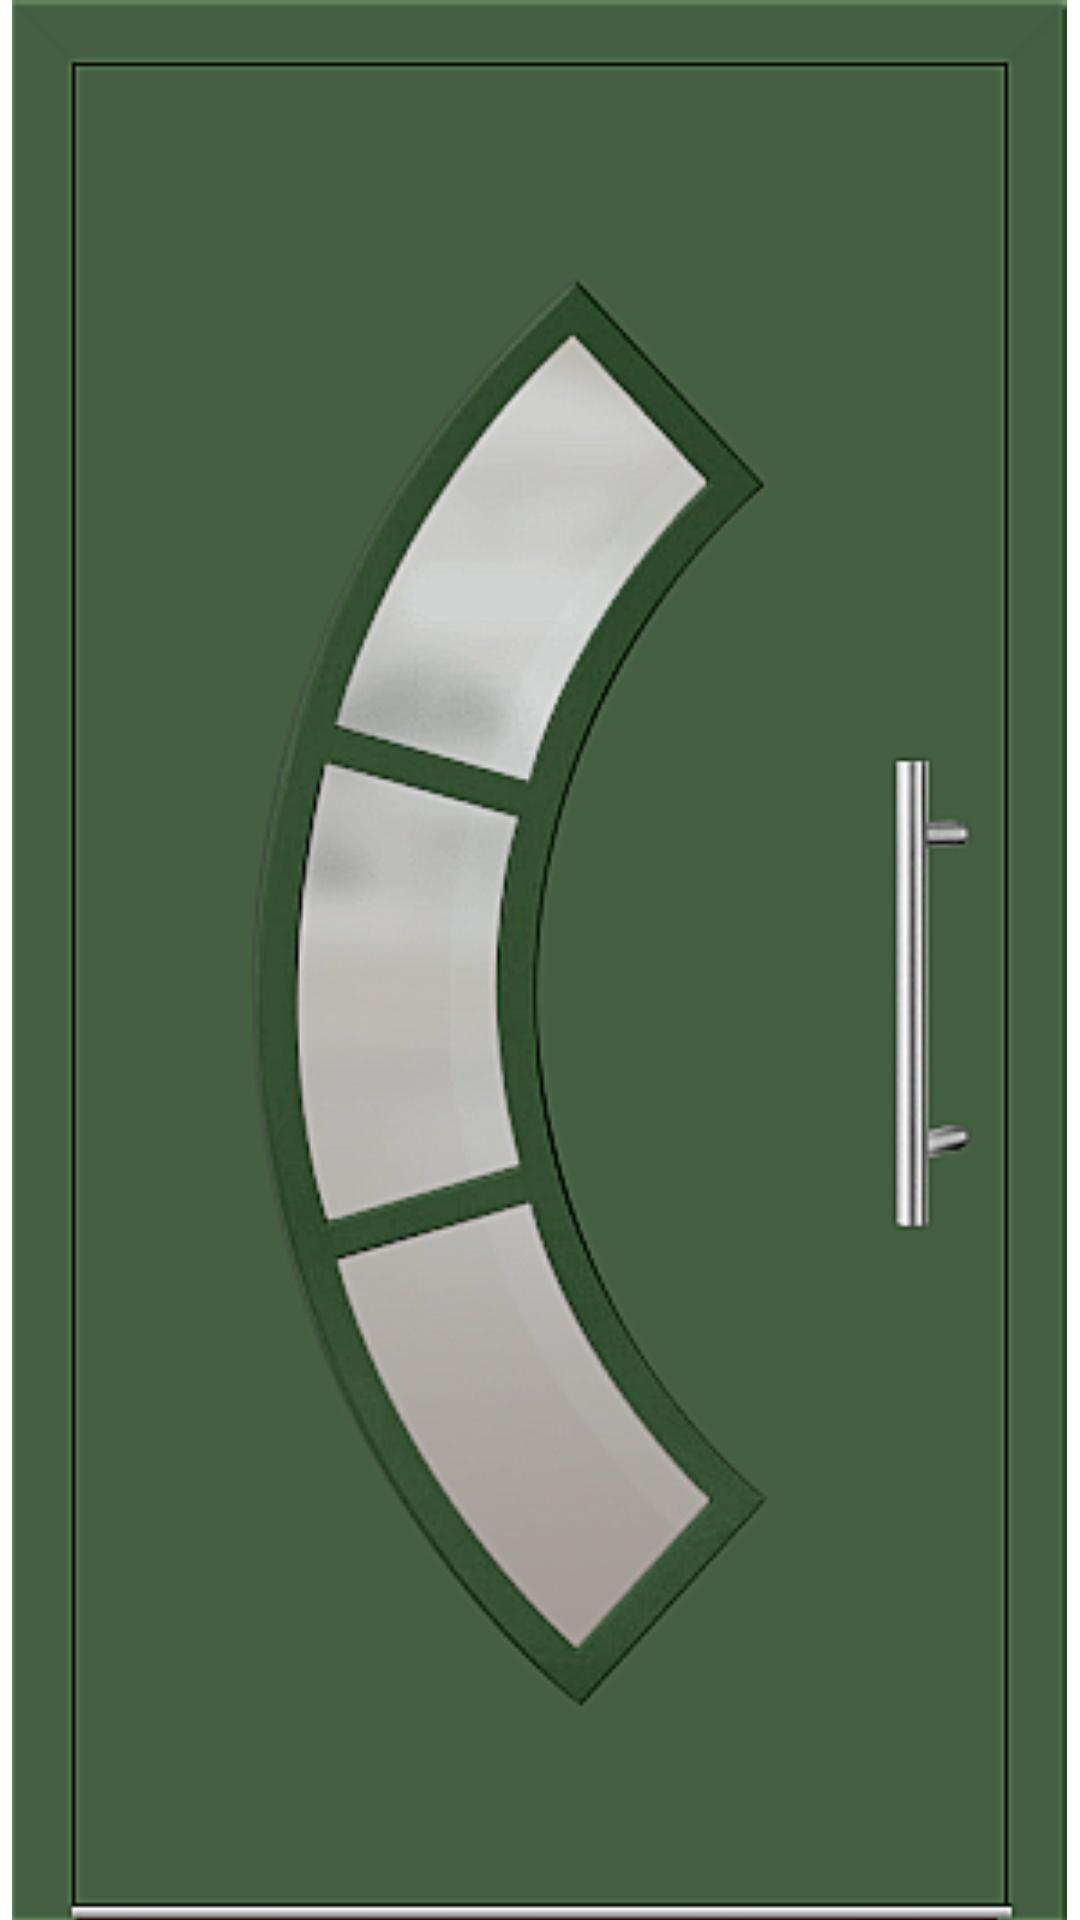 Aluminium Haustür Modell 6440-65 laubgrün